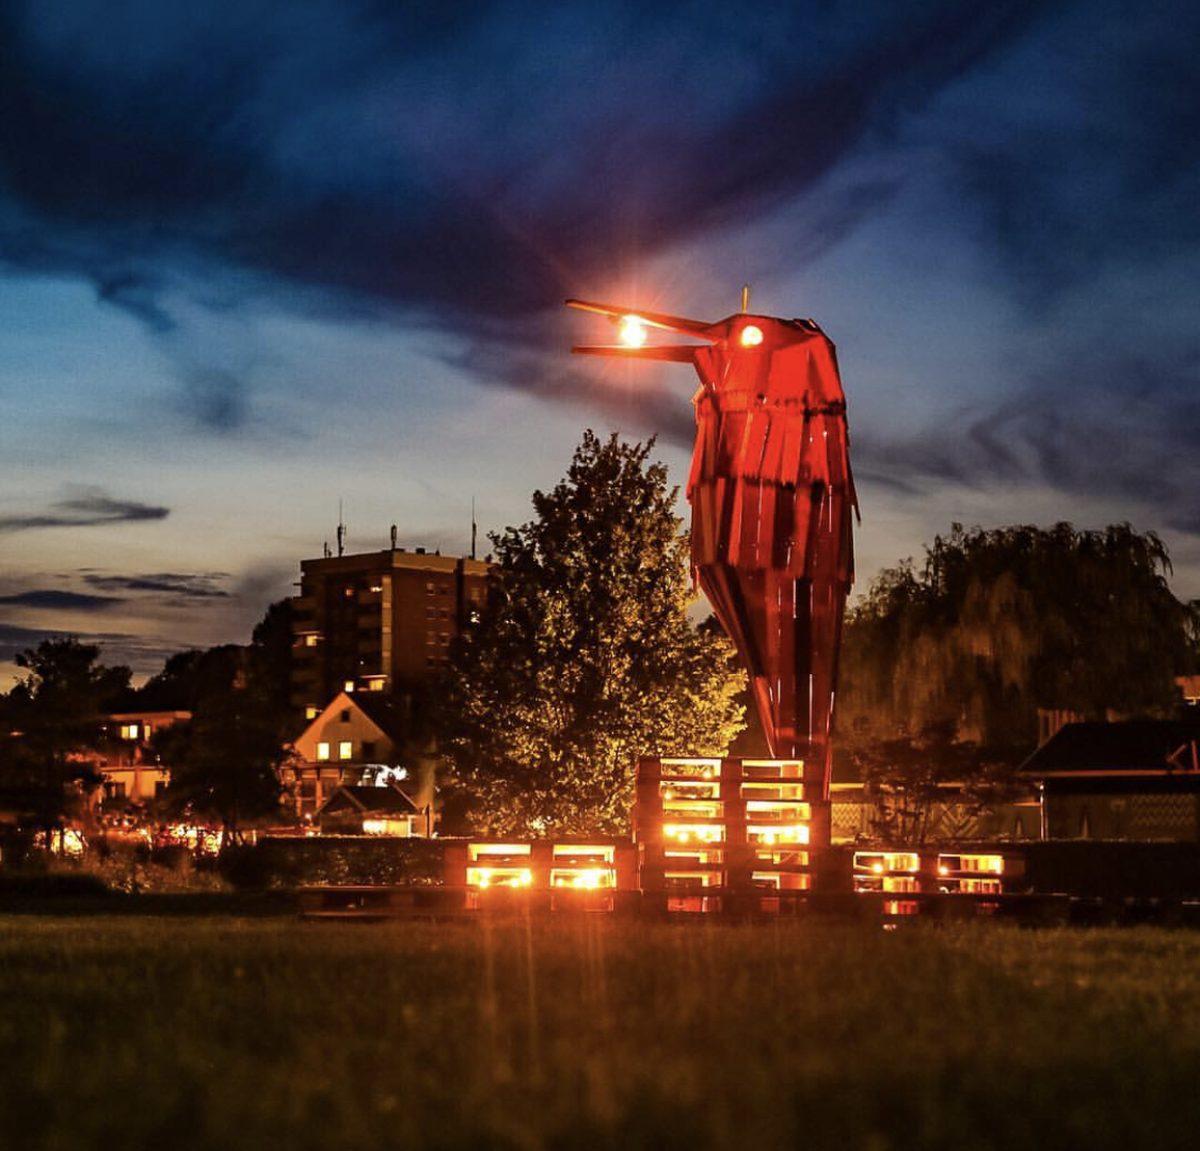 Norden - the nordic arts Festial